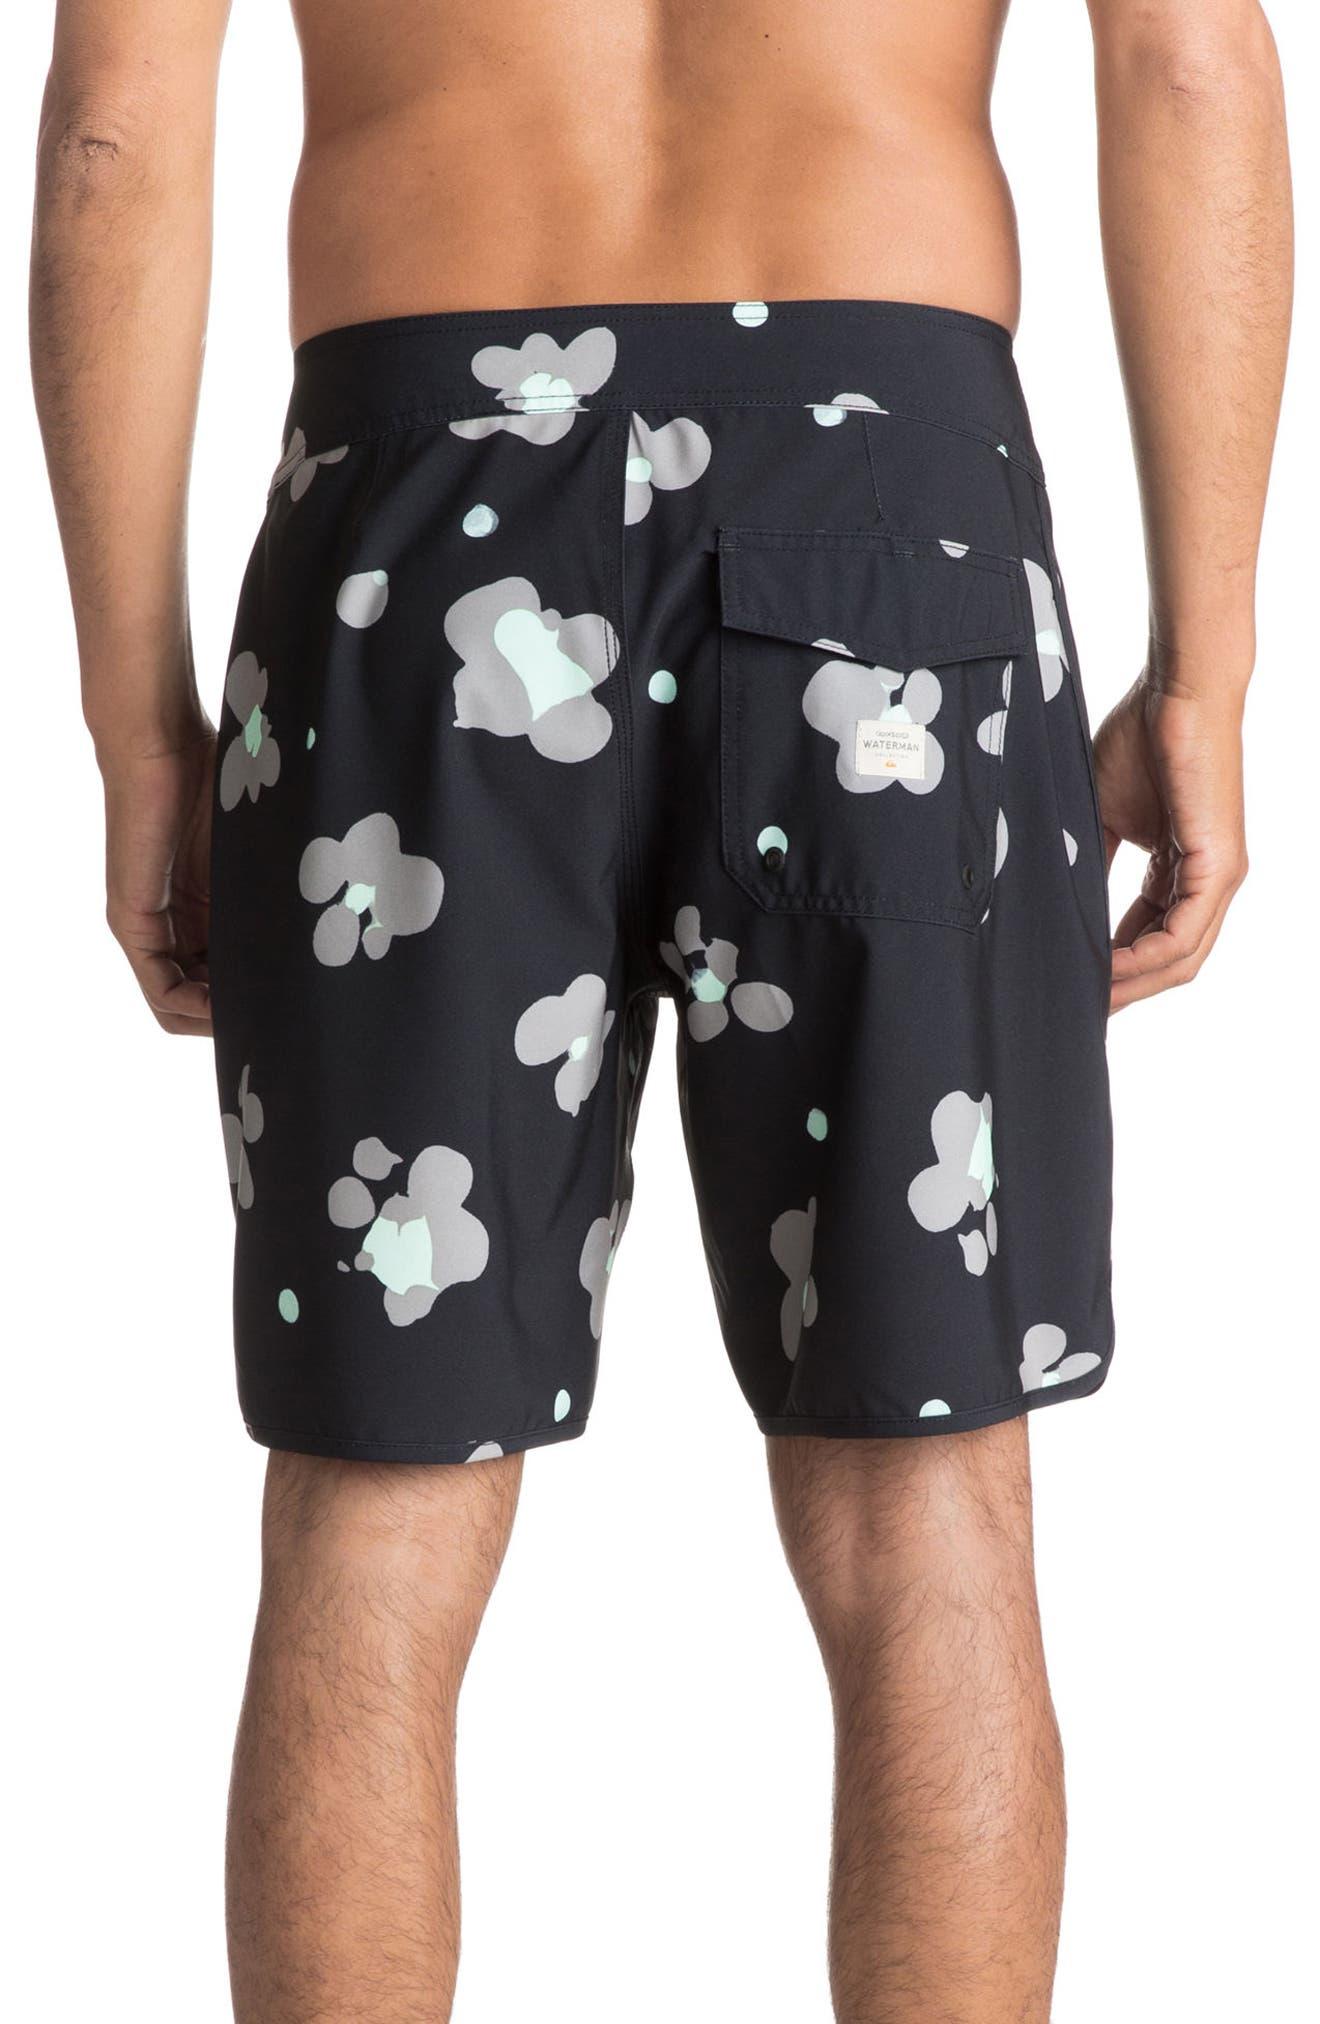 Pelai Board Shorts,                             Alternate thumbnail 2, color,                             002